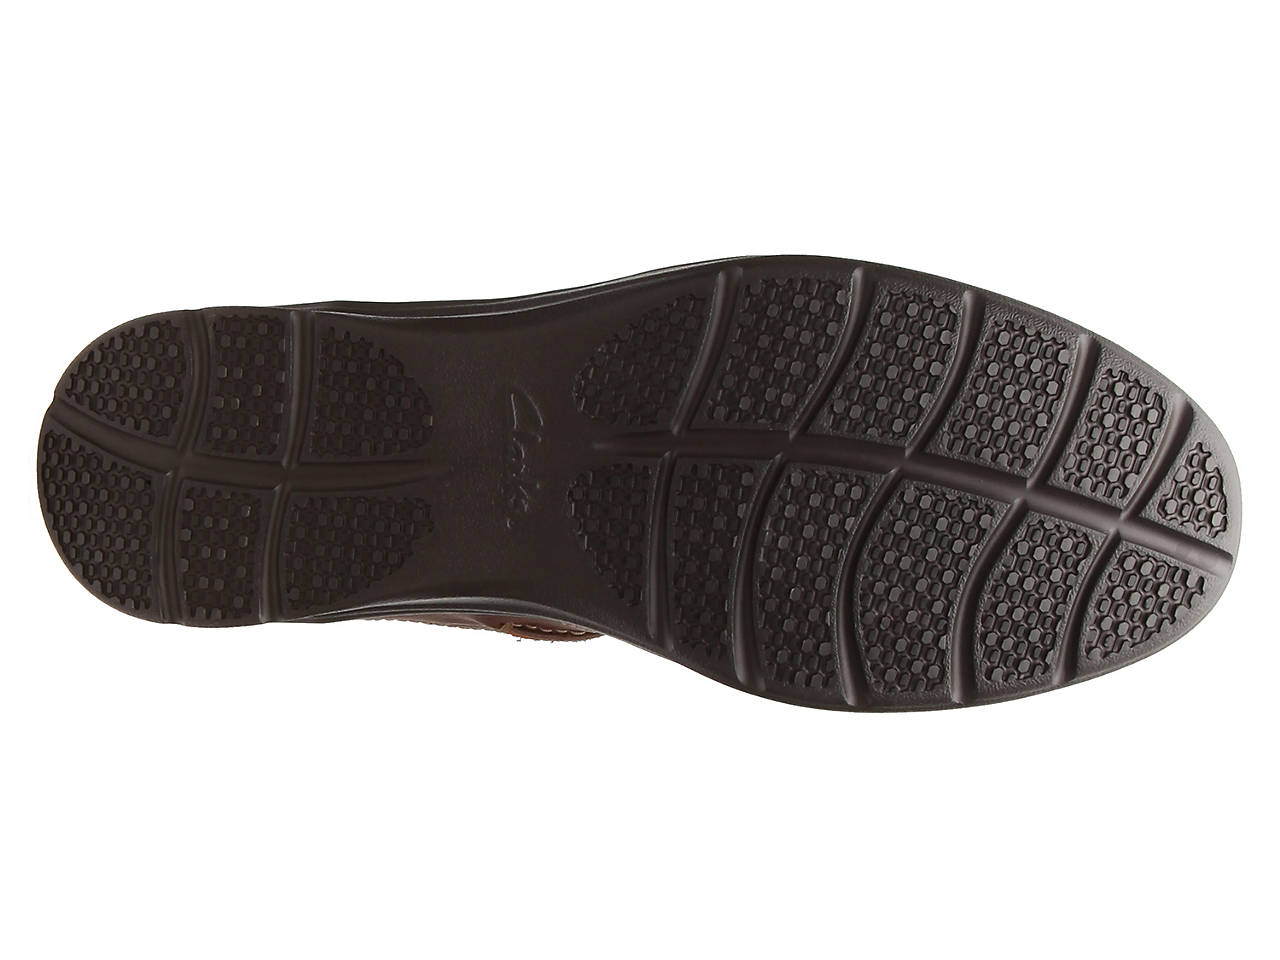 bc8c309fb4 Clarks Cotrell Walk Oxford Men s Shoes